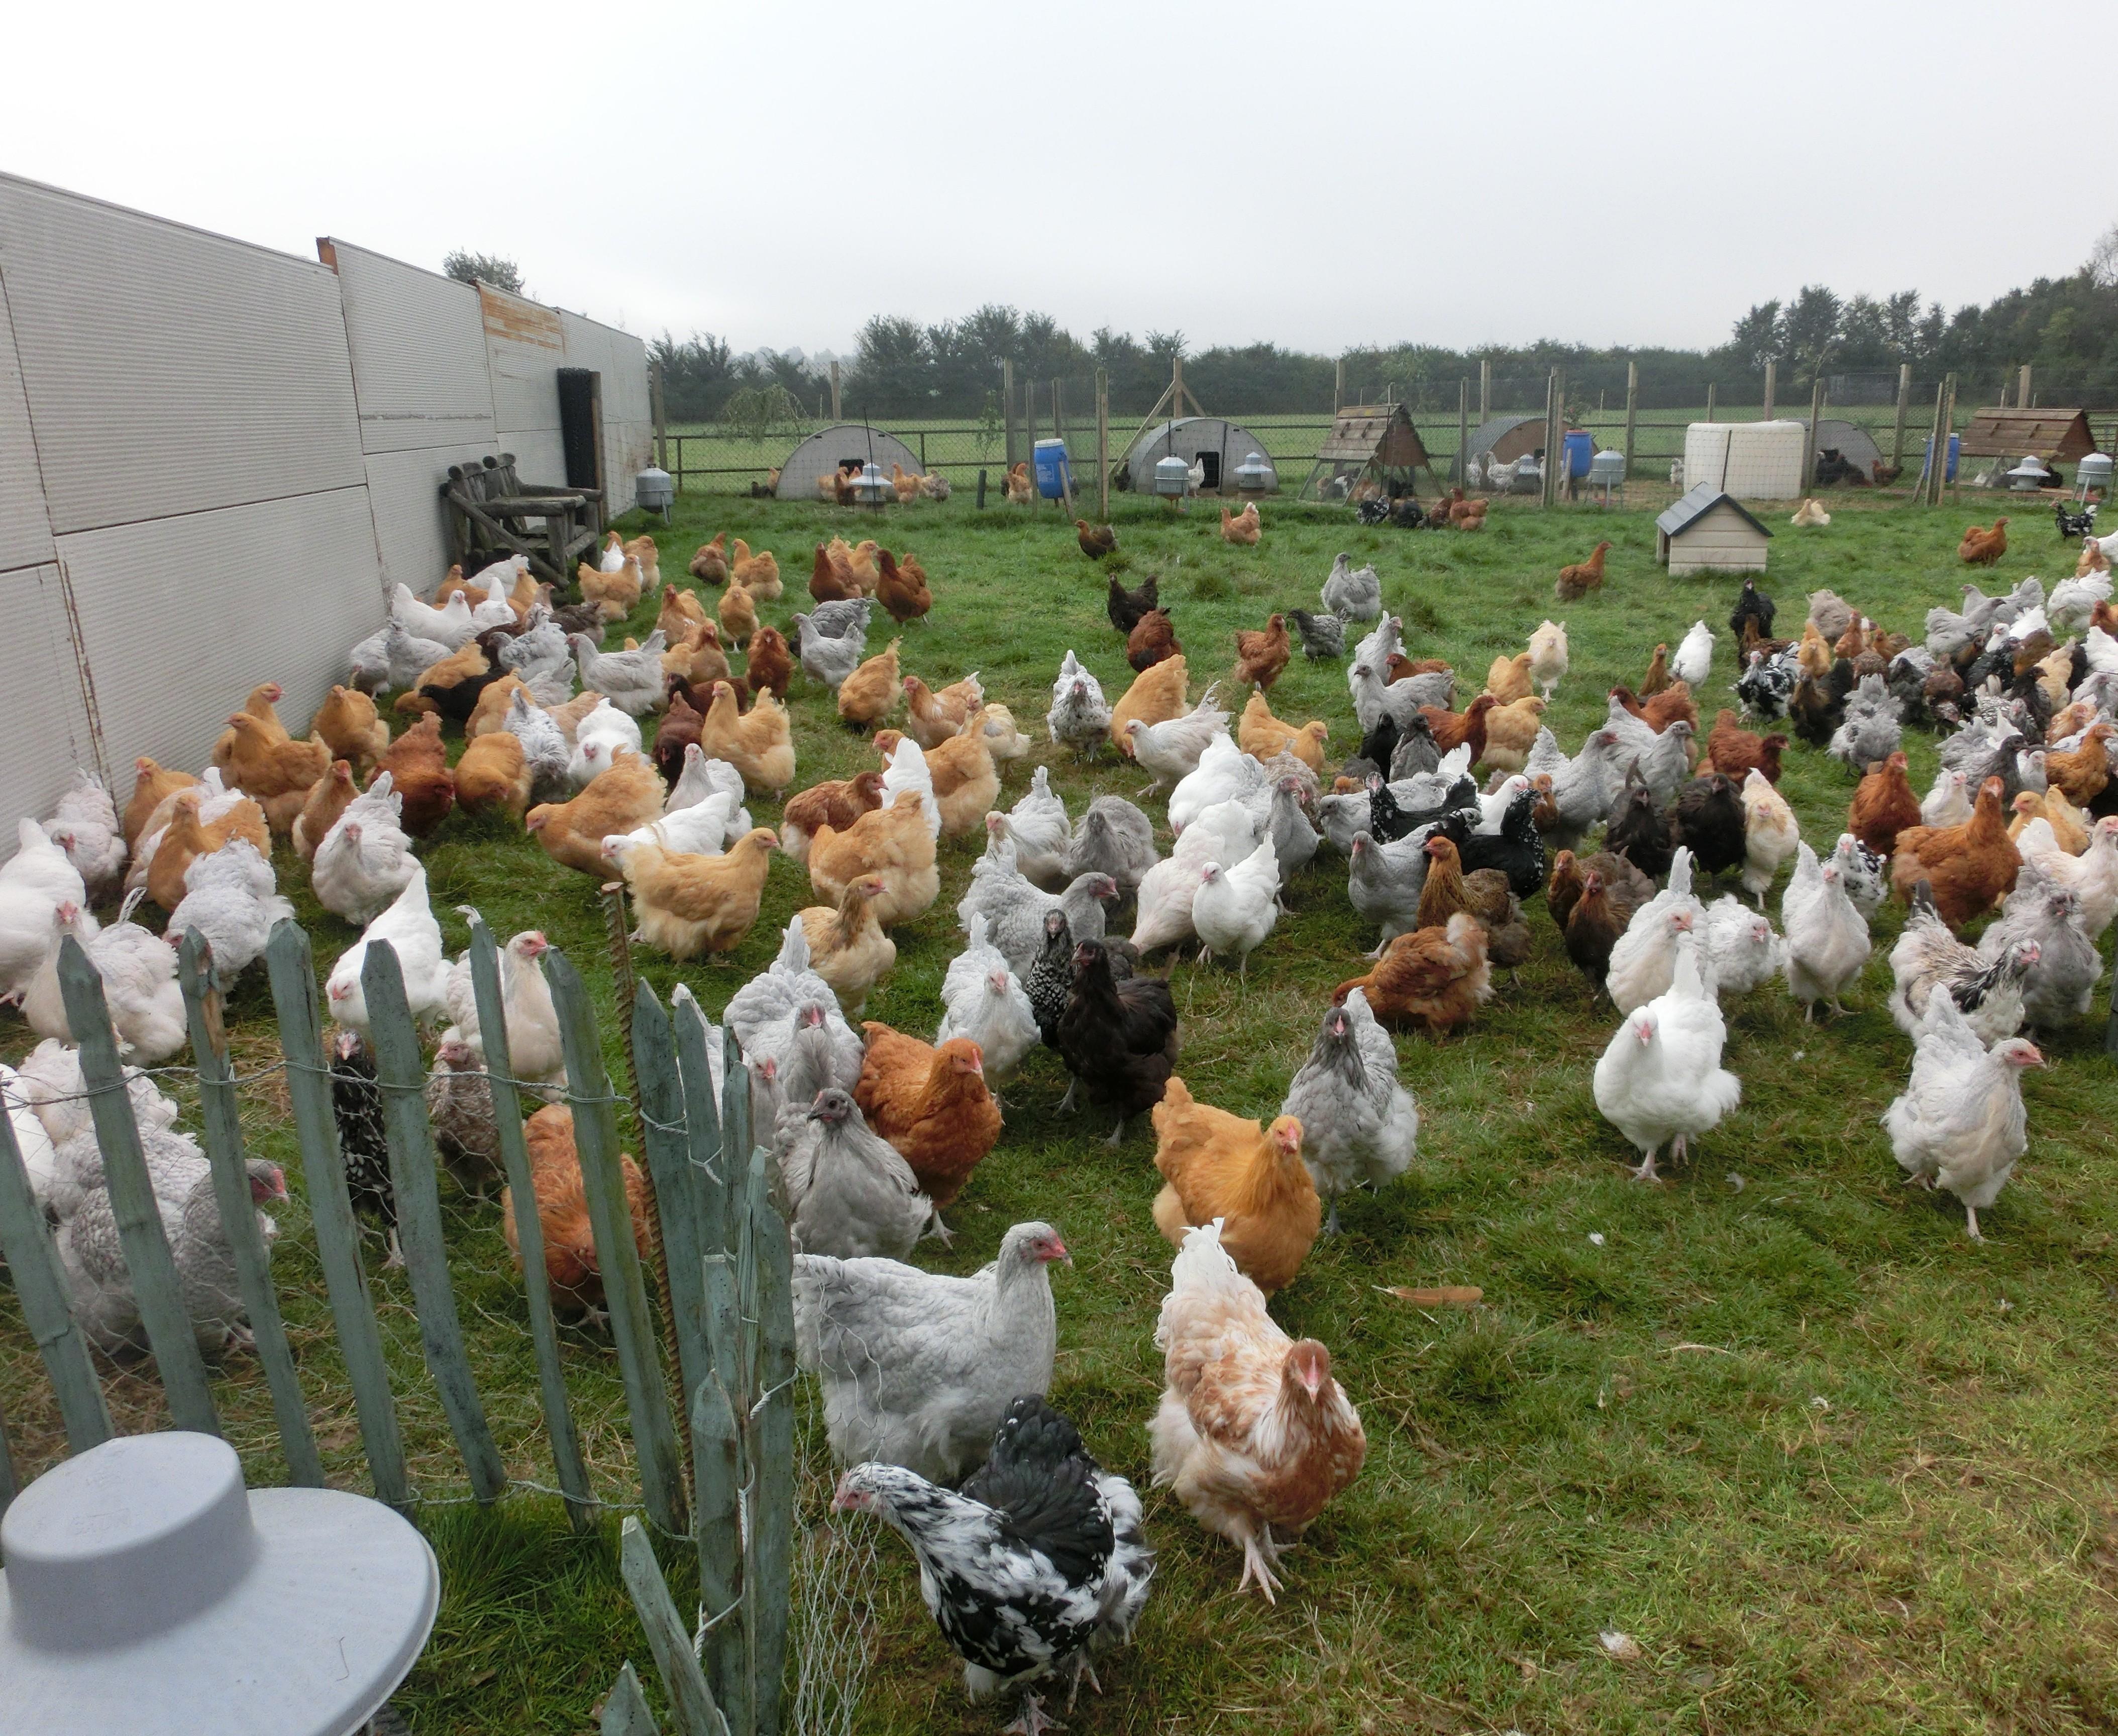 Orpington Chickens Essex Orpingtons